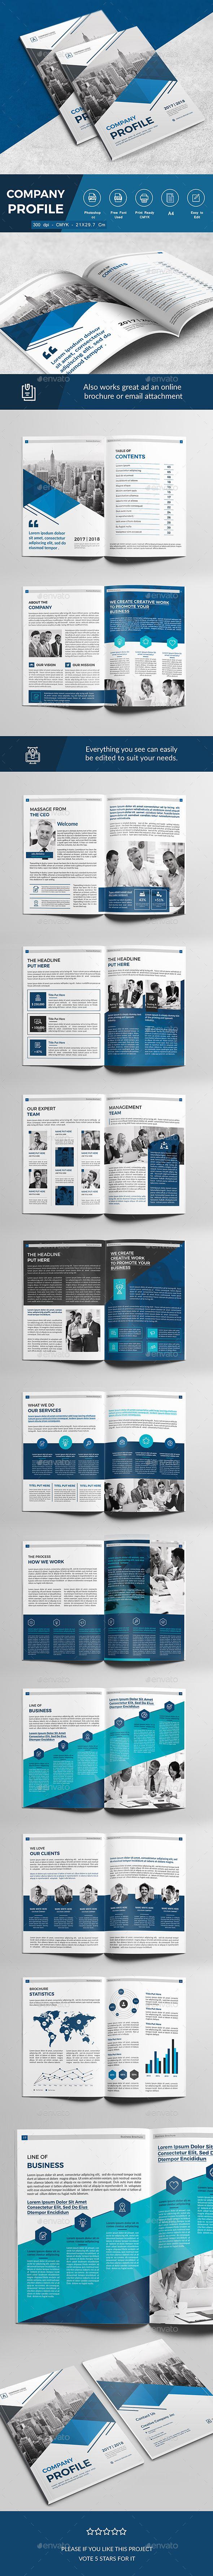 Company Profile — Photoshop PSD #unique #informational